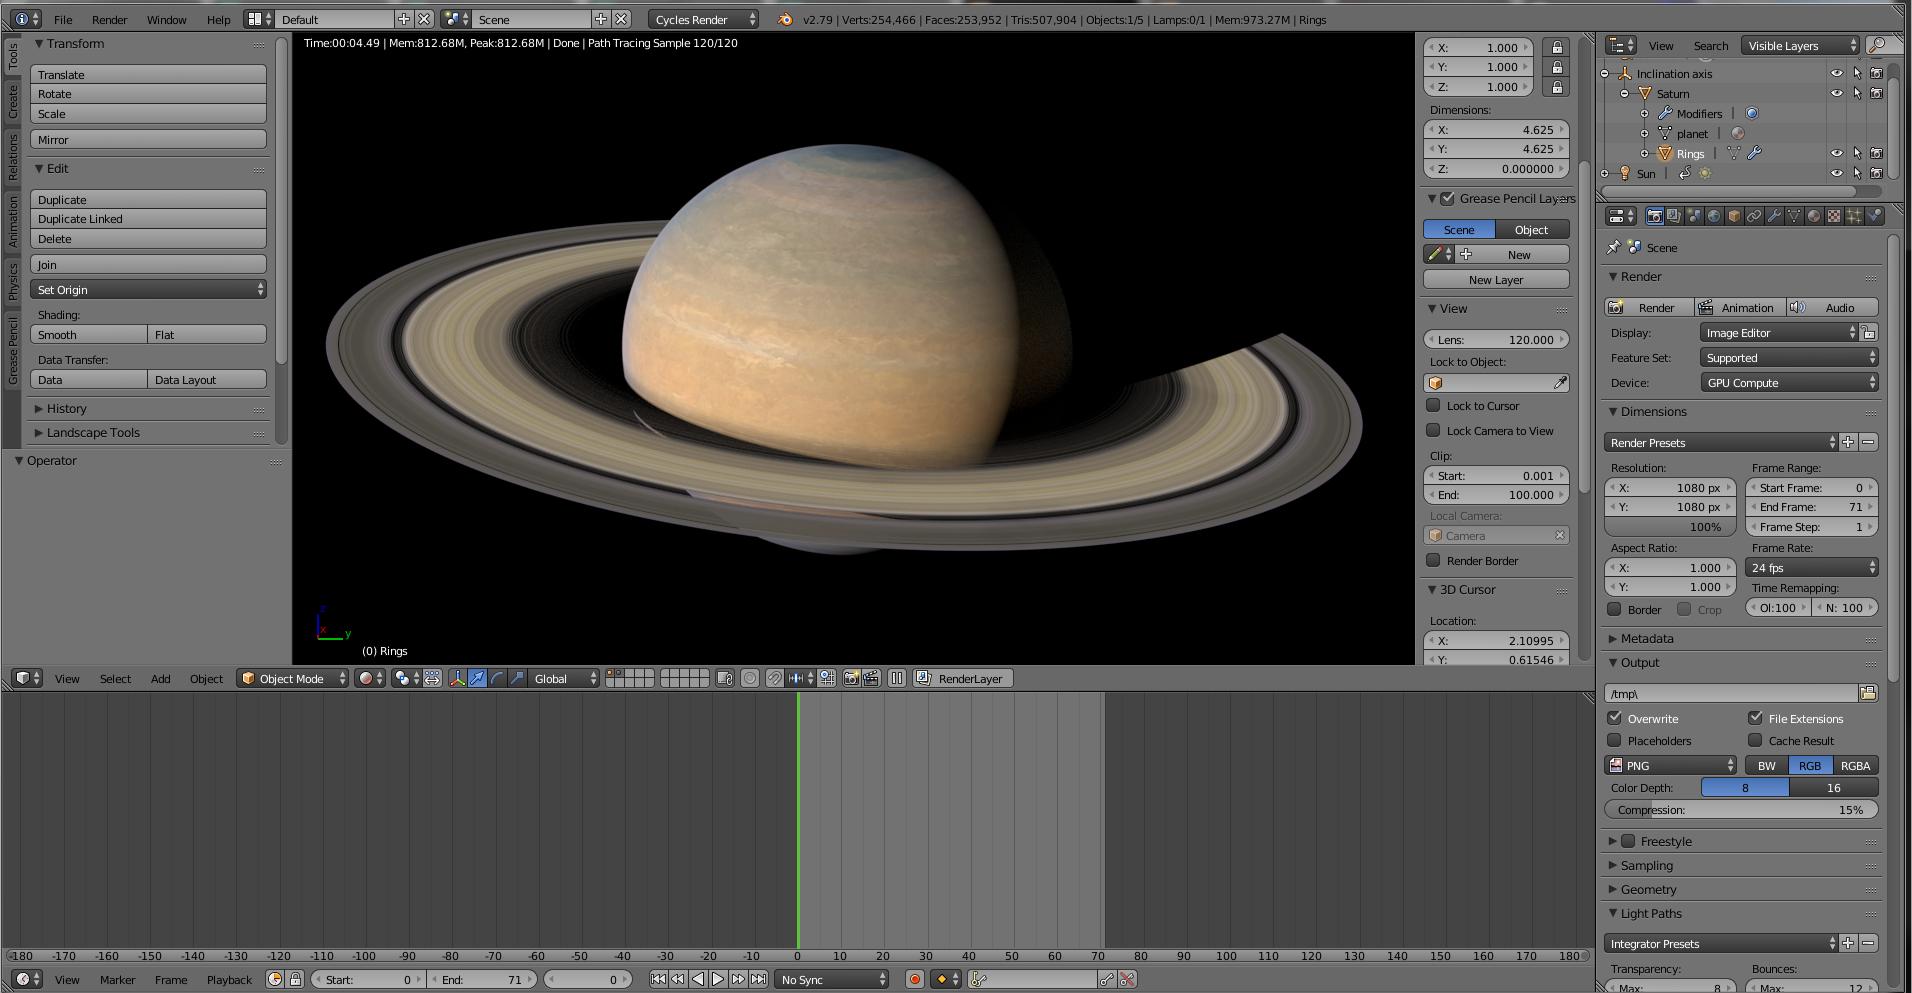 Photorealistic Saturn 16k textures